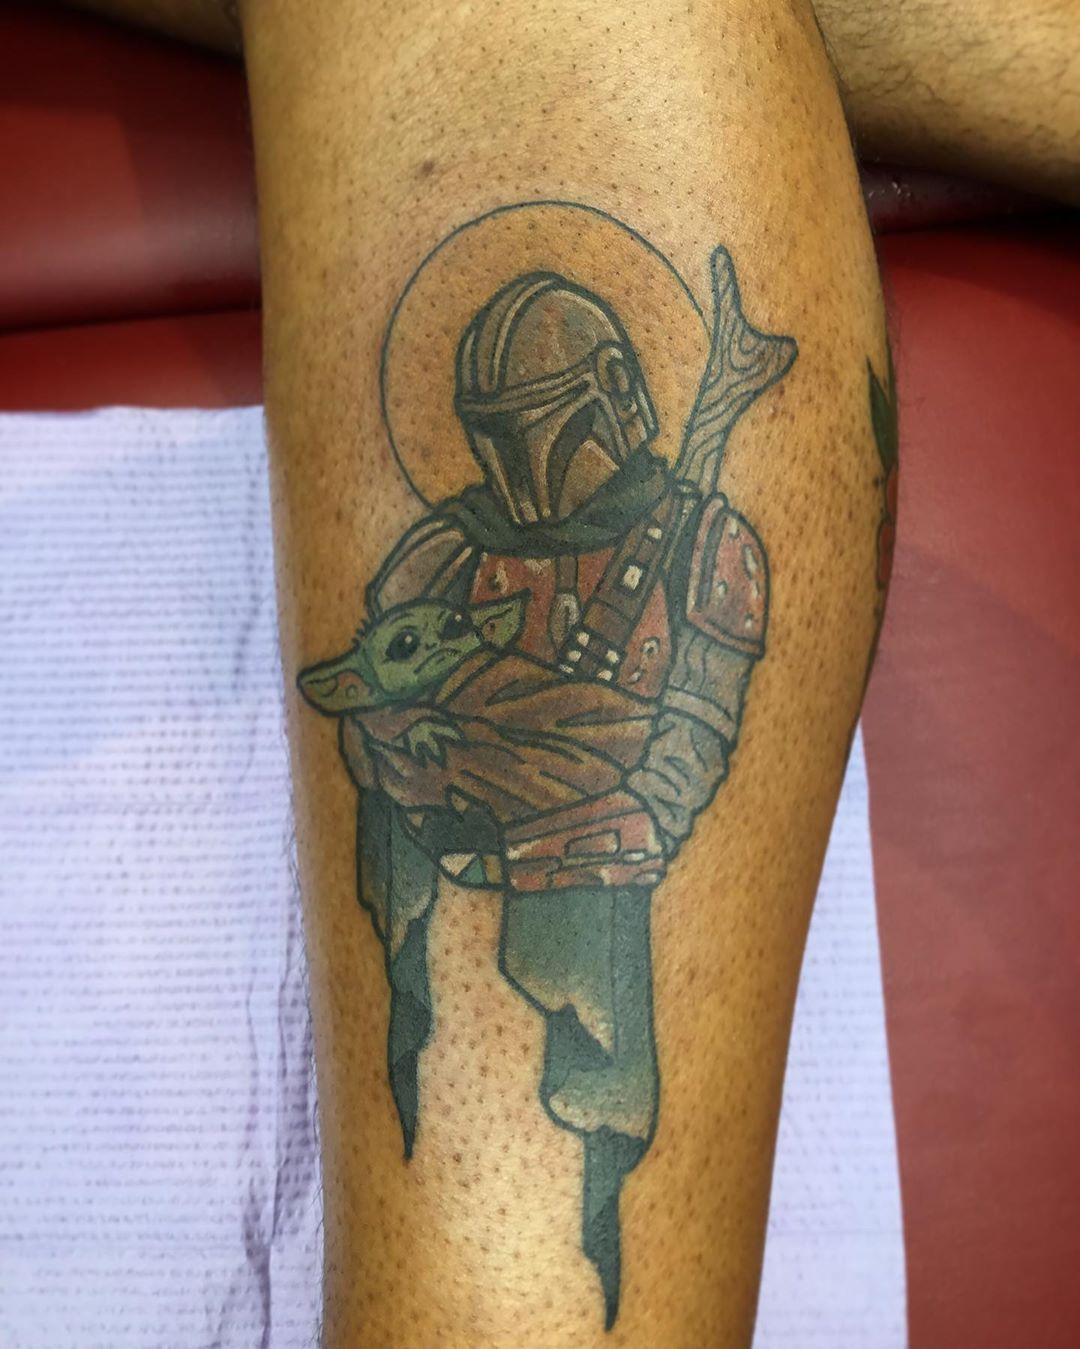 Mandalorian holding baby Yoda tattoo